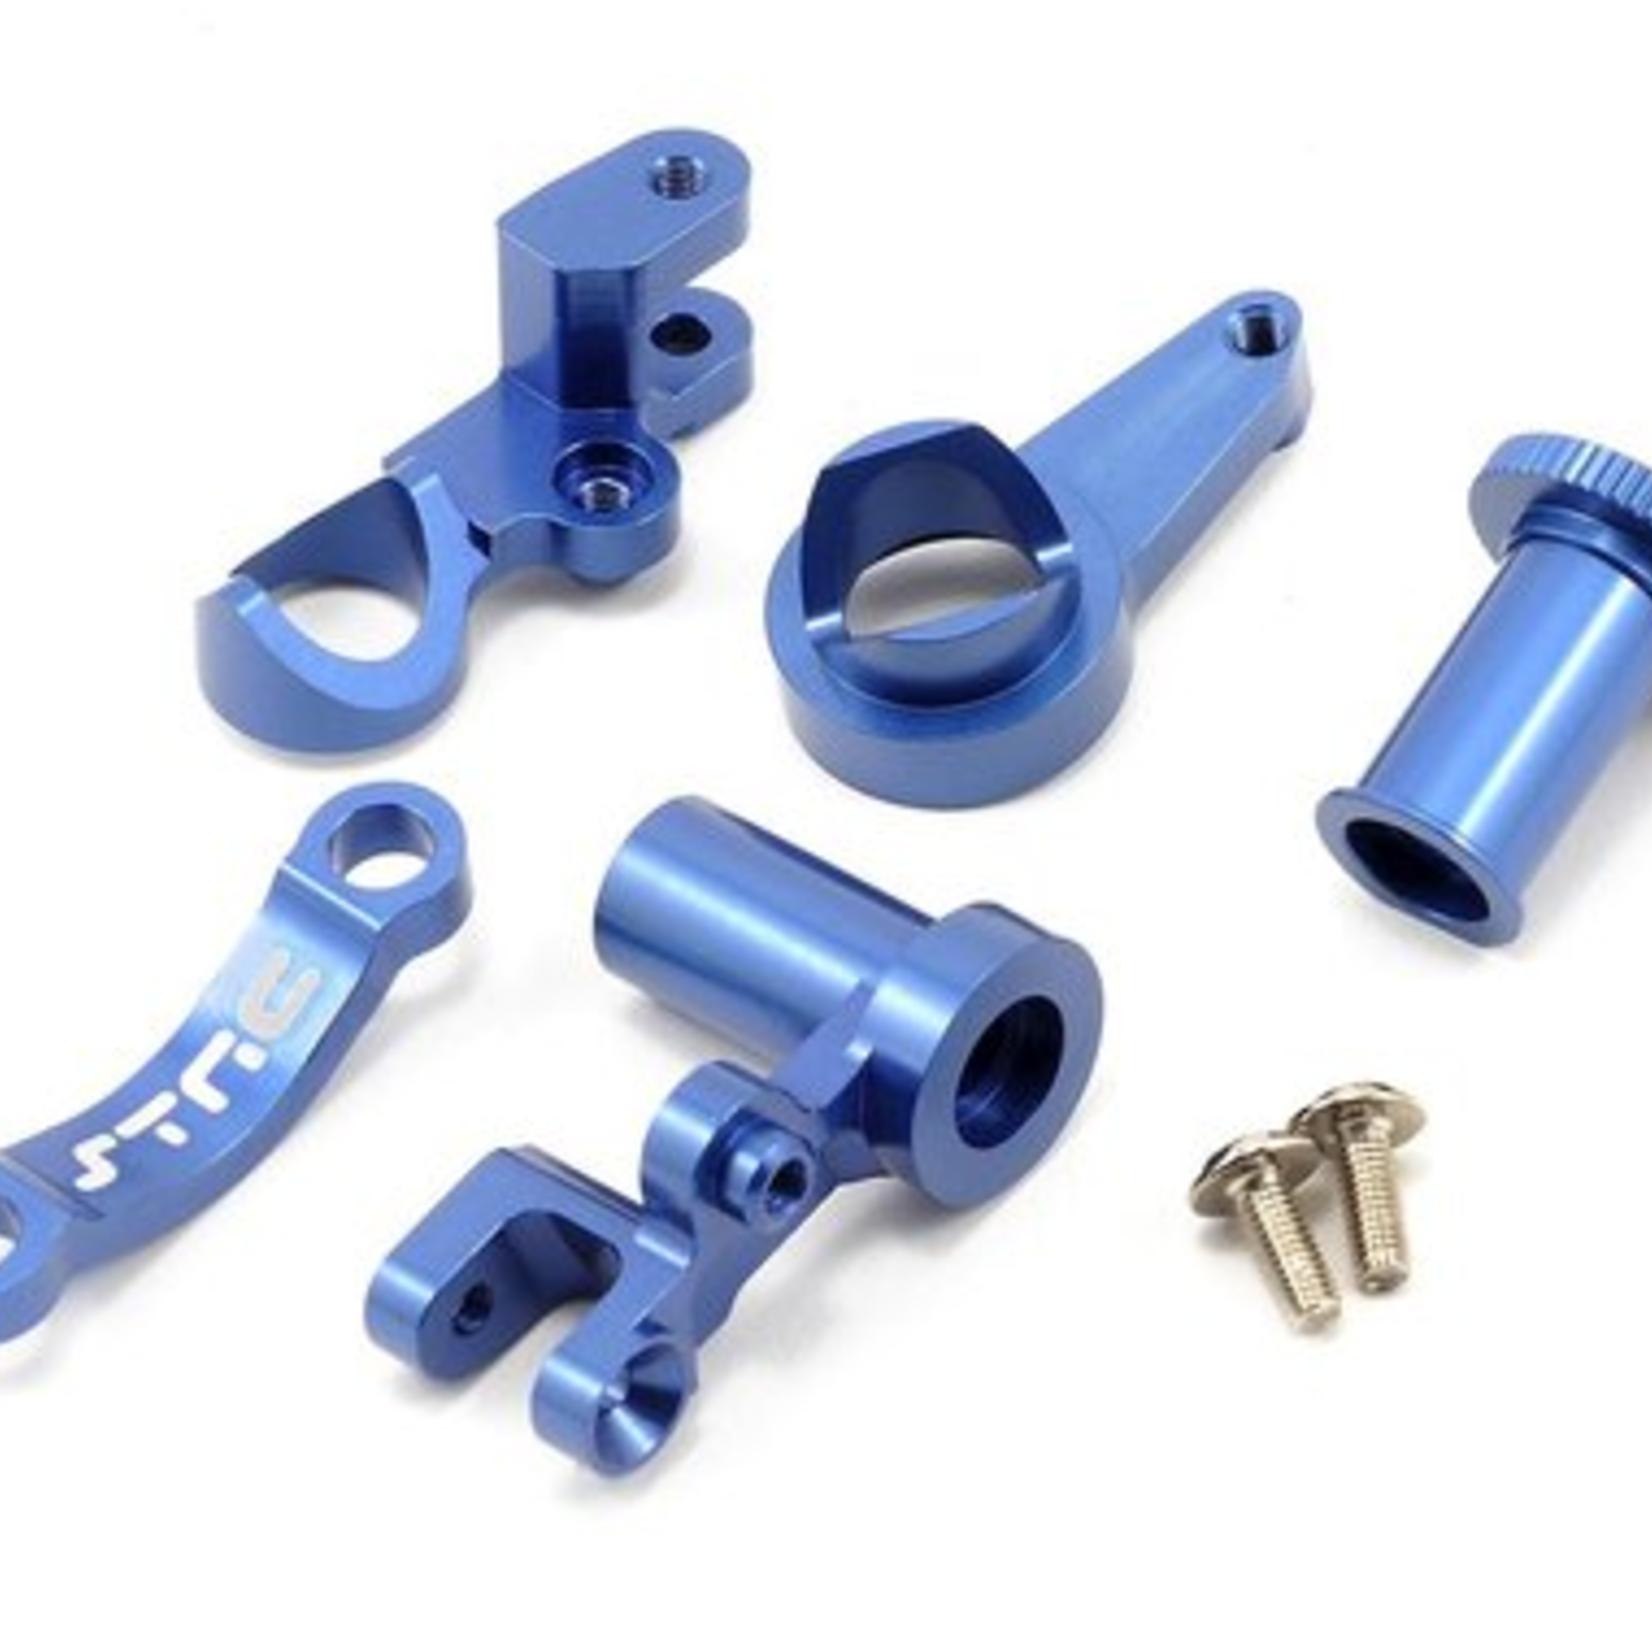 ST Racing Concepts SPTST6845B ST Racing Concepts CNC Machined Aluminum Multi-Piece STeering Bellcrank set (Blue)